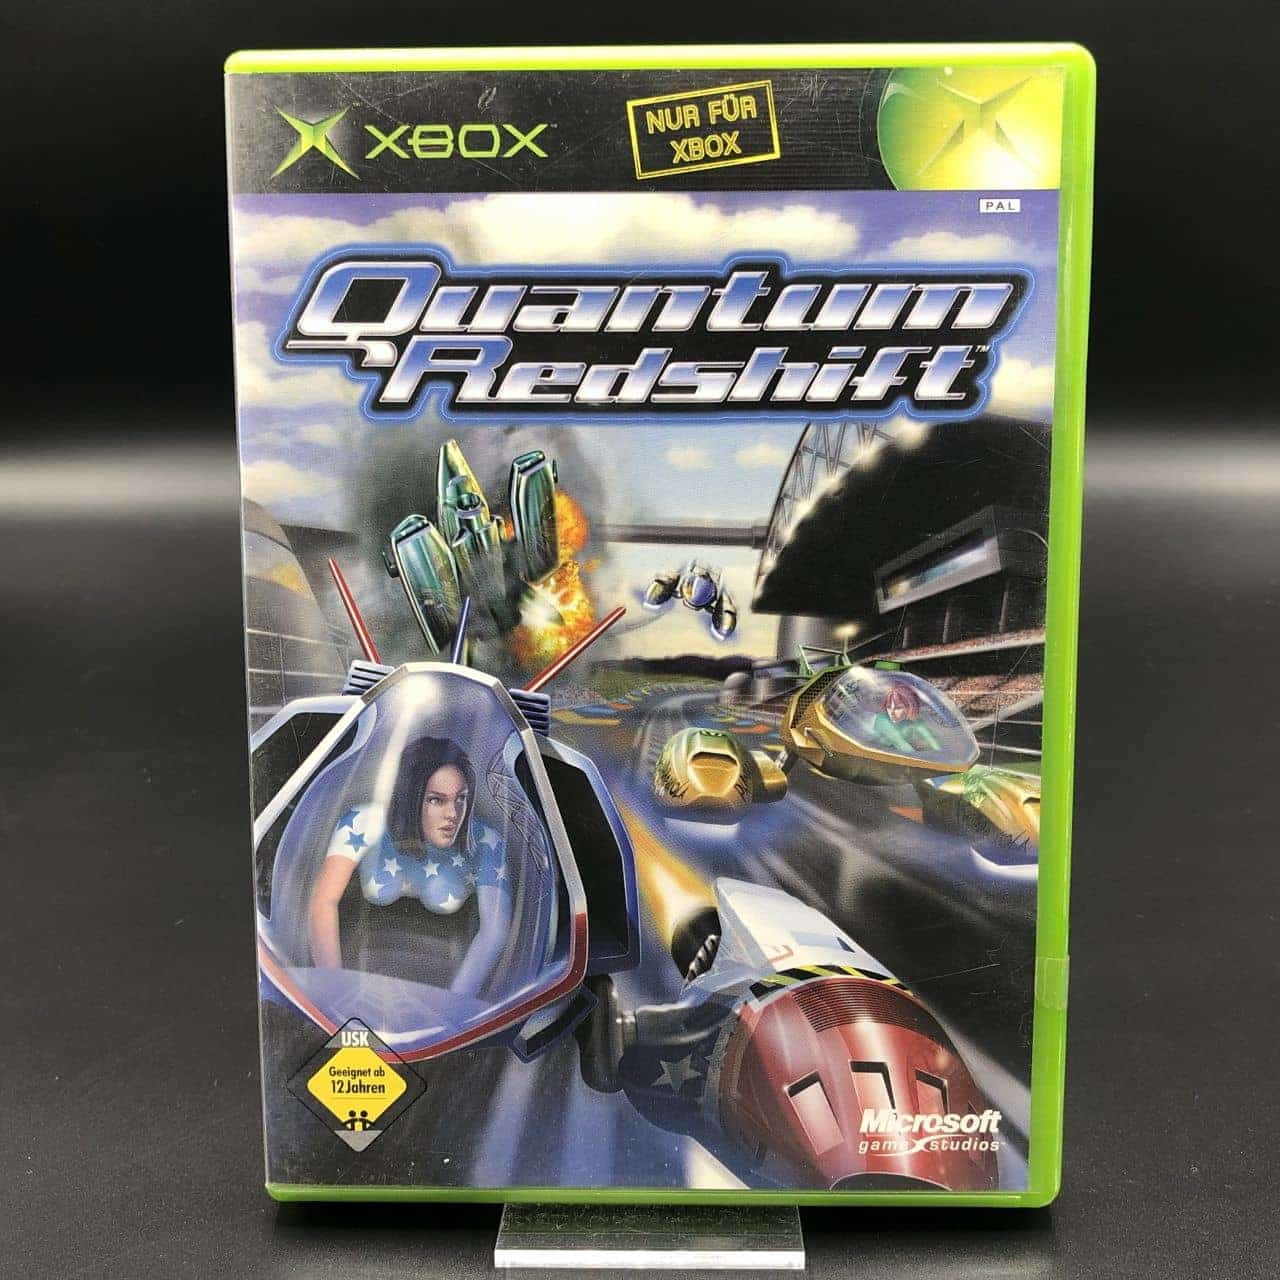 XBC Quantum Redshift (Komplett) (Sehr gut) Microsoft Xbox Classic